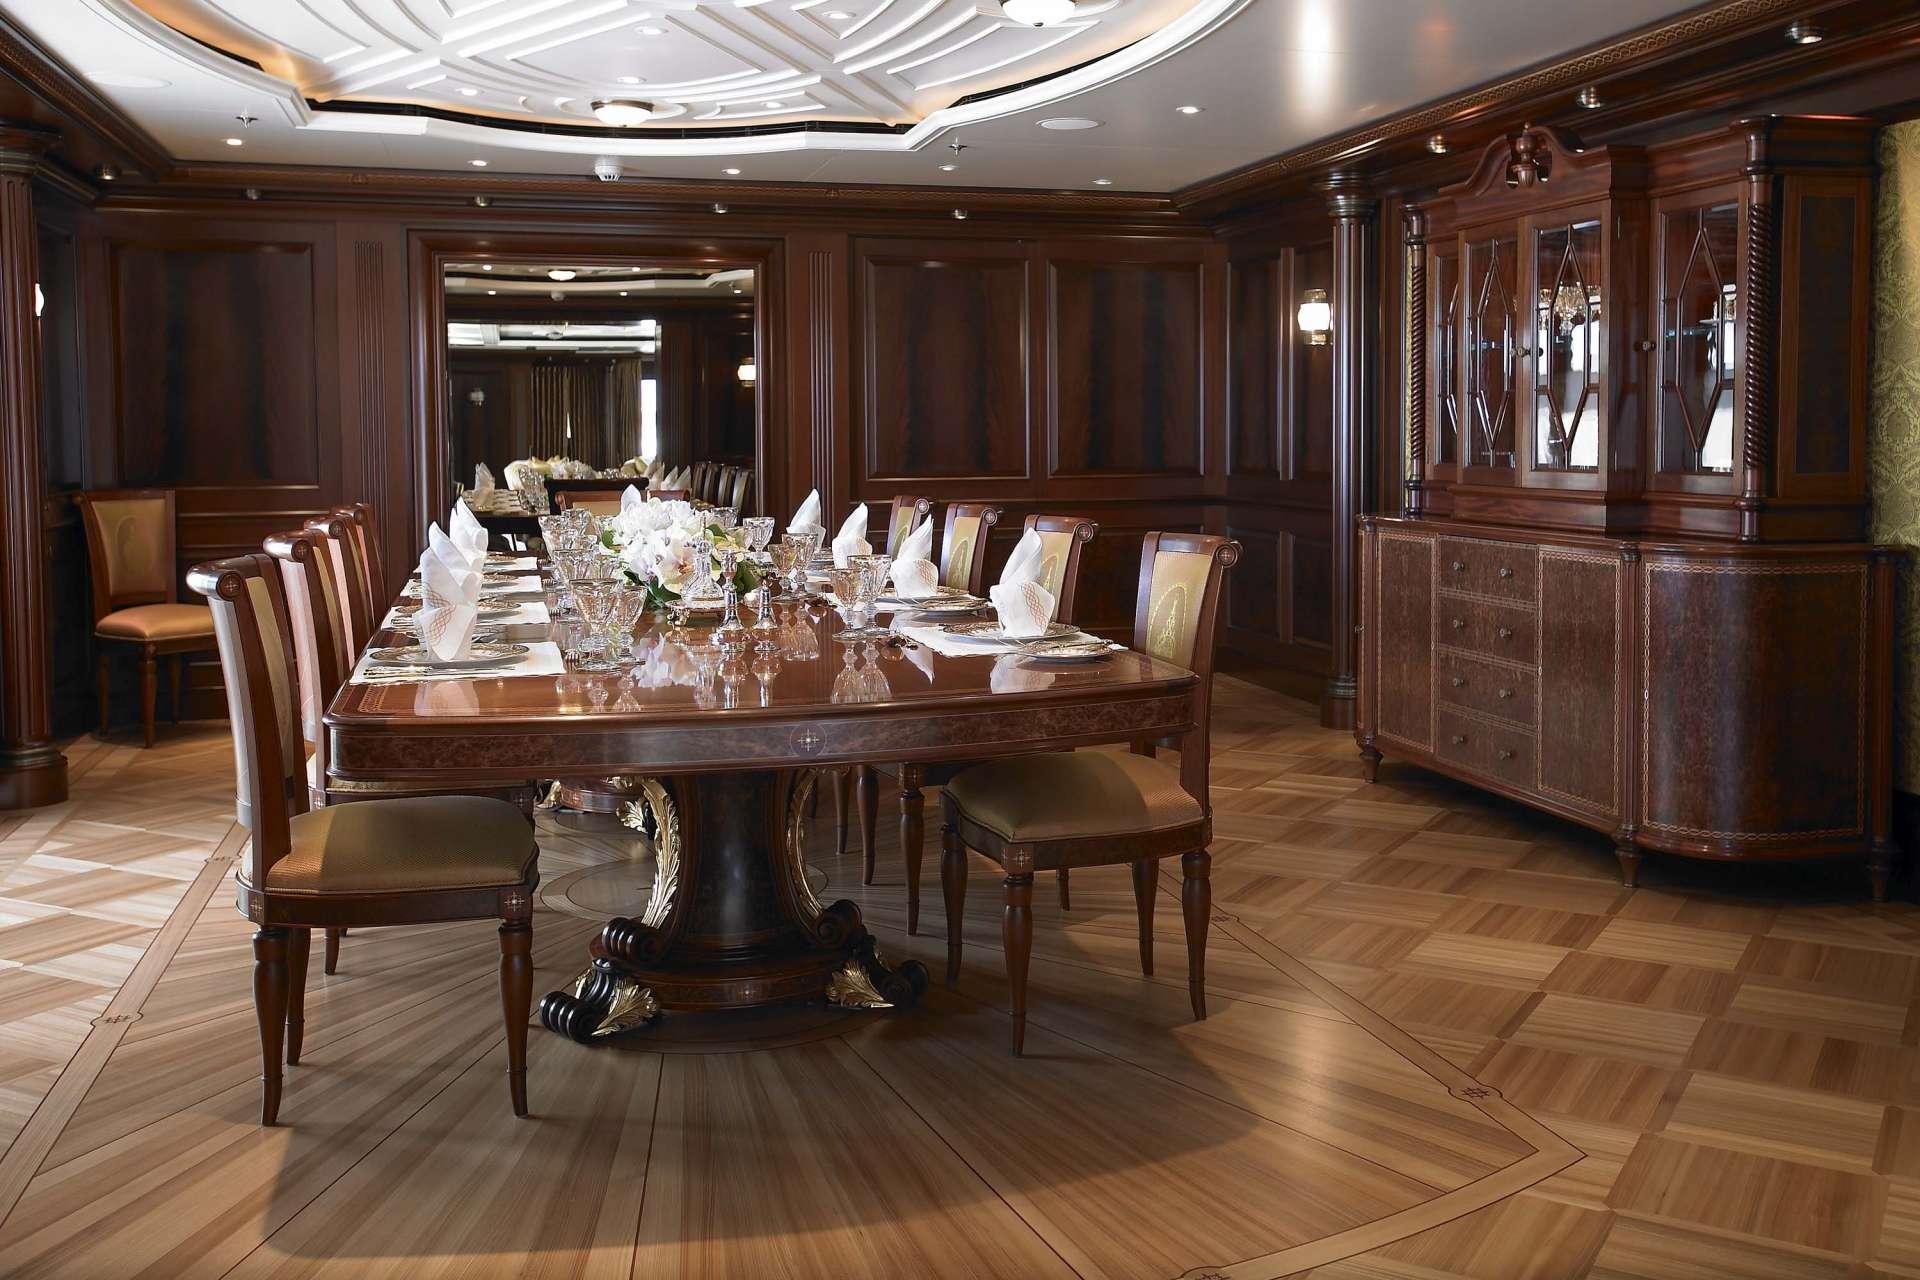 Luxury Dining Room Luxury Yacht ANNA Formal Dining Room Photo Credit Feadship Luxury Yacht C